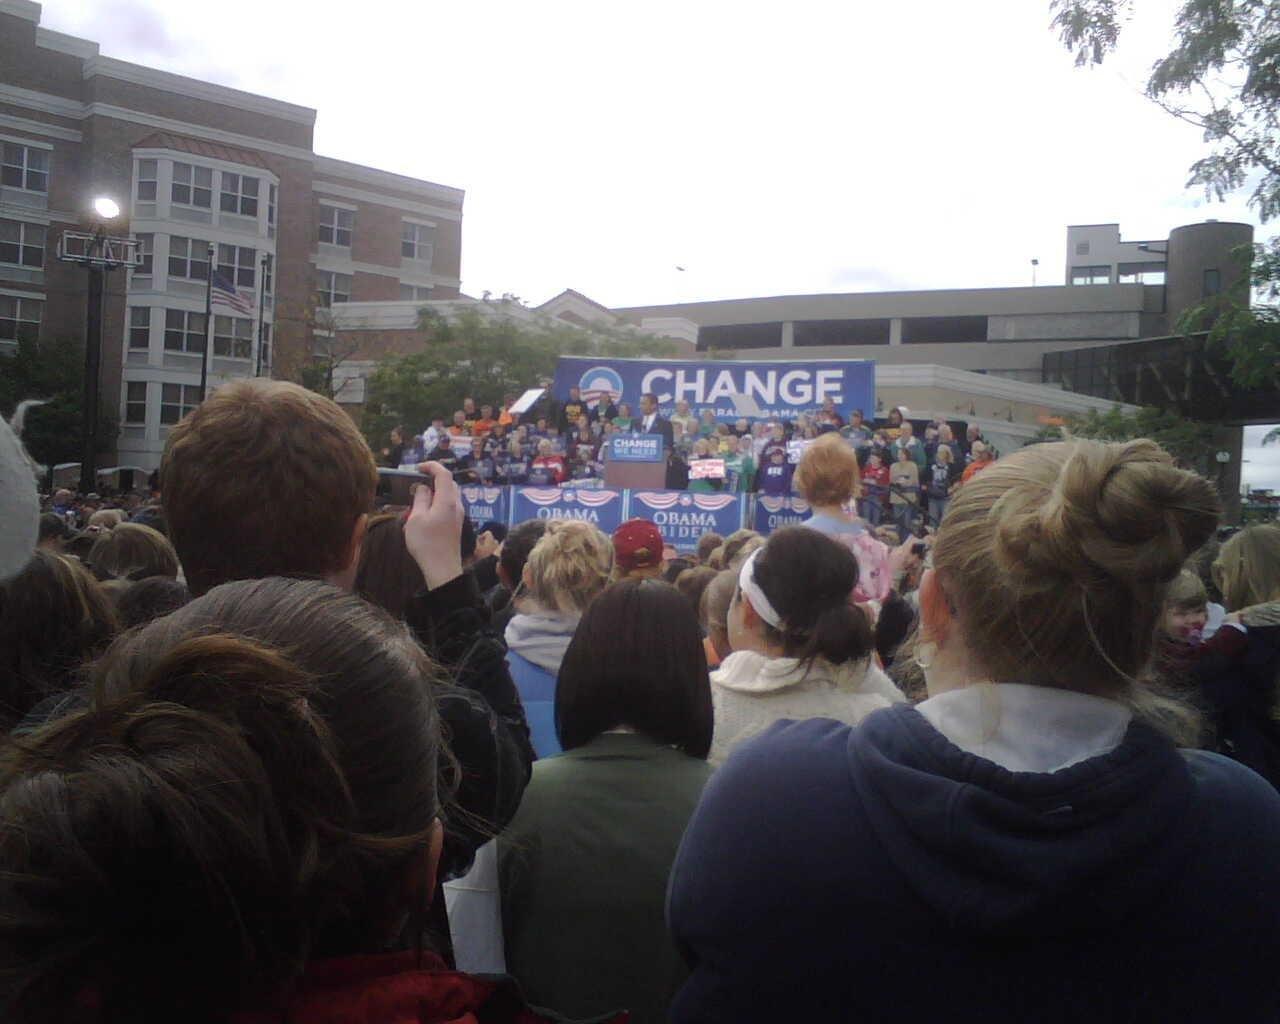 Obama took the stage around 10 a.m. Wednesday